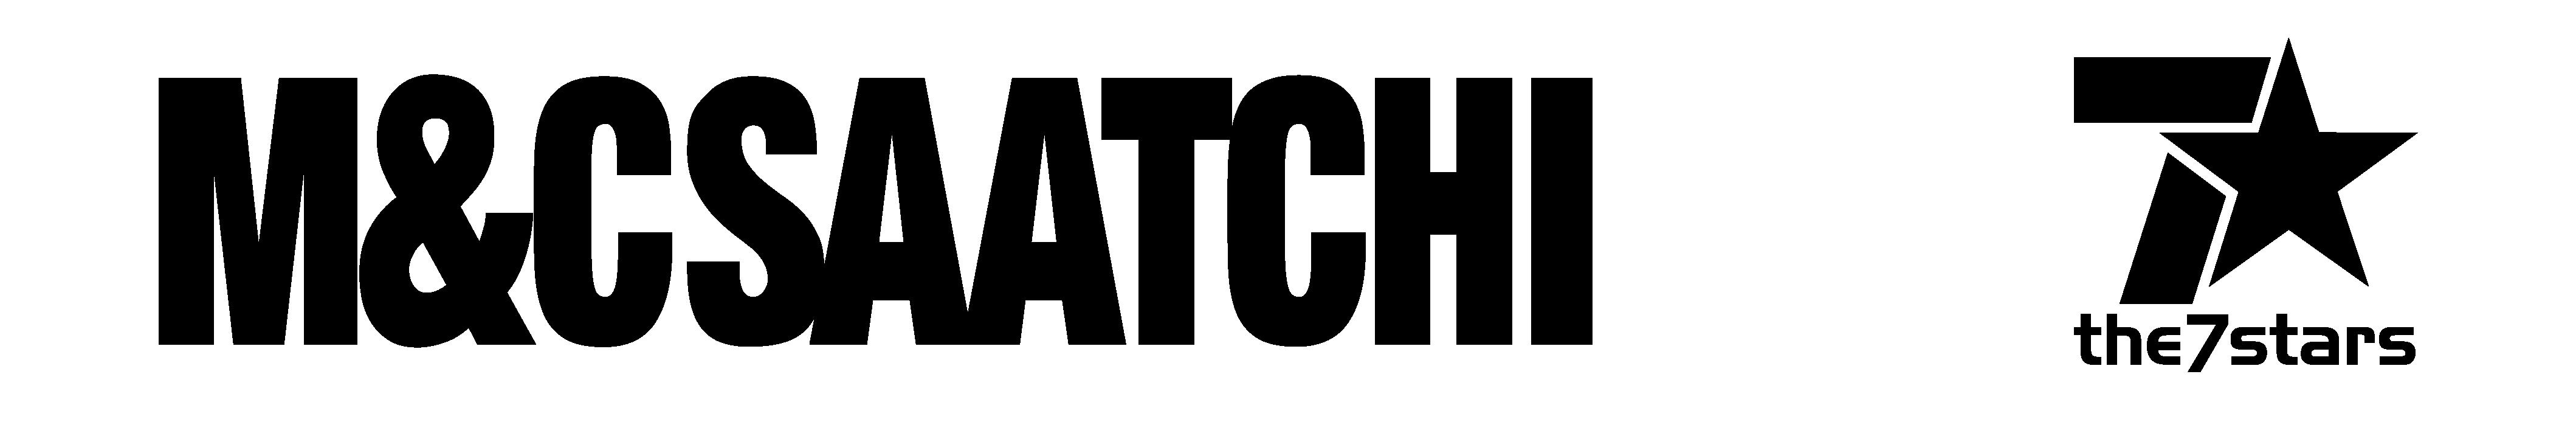 MCSaatchi_7Stars_logo-01